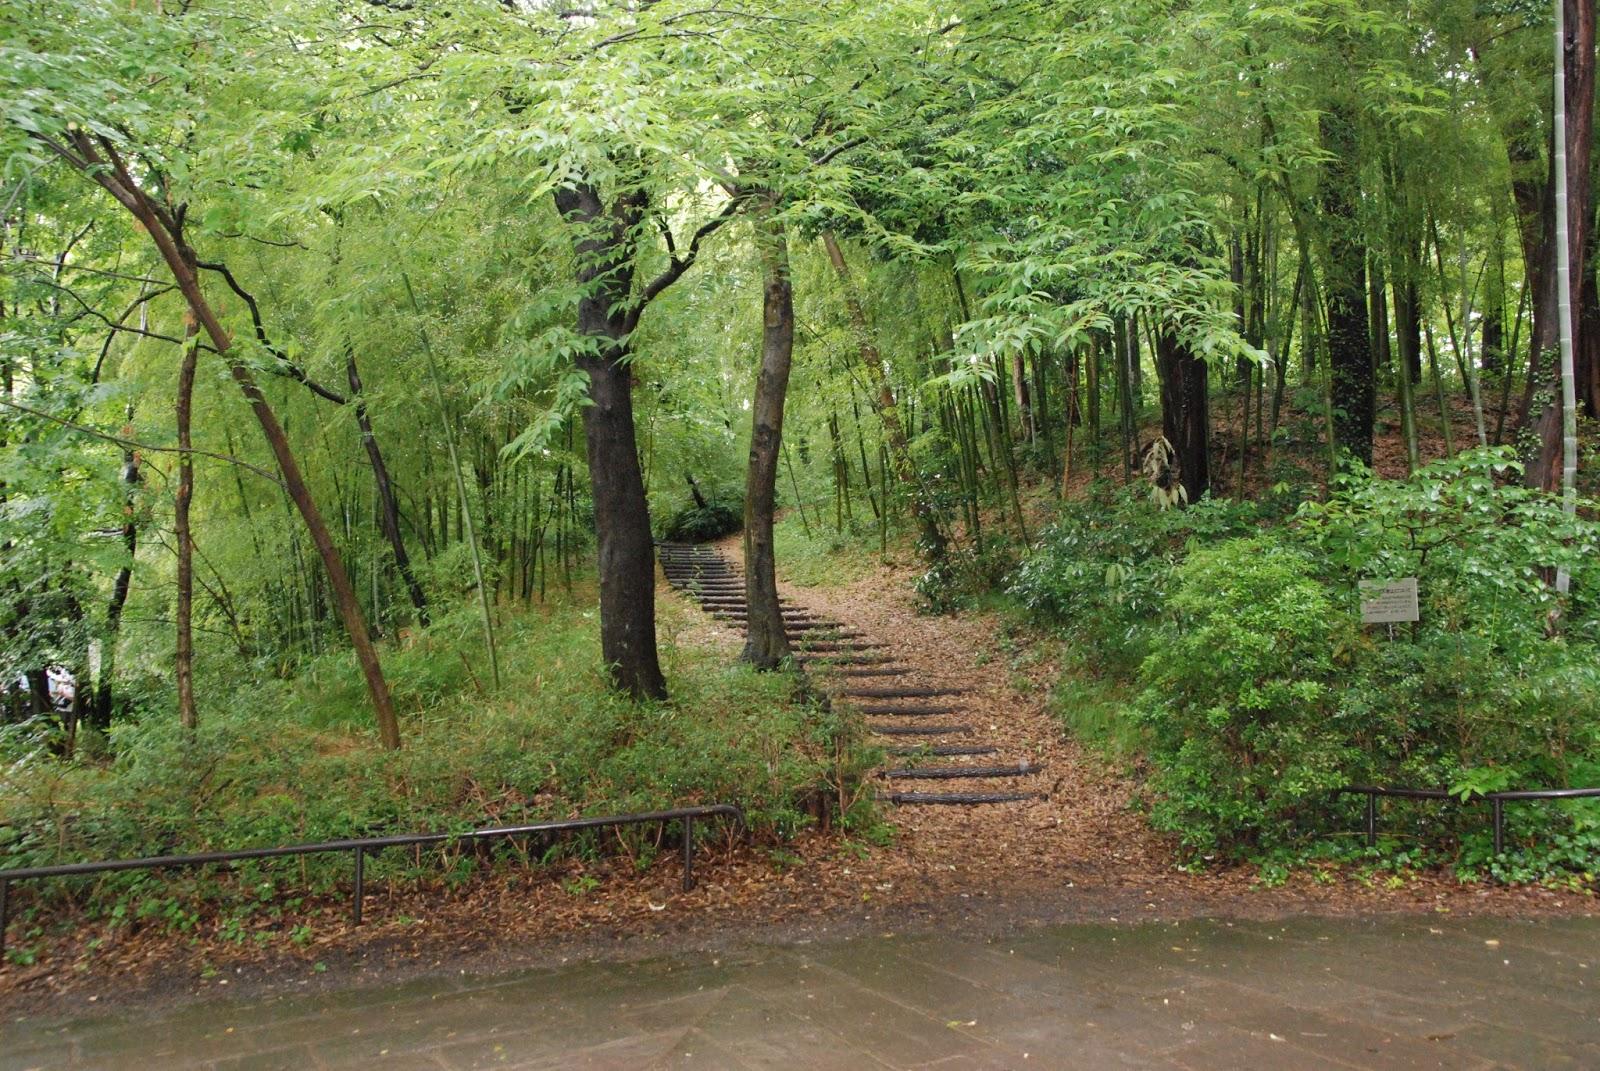 Leben in japan juni june regenzeit rainy season in japan for Traditionelles japan